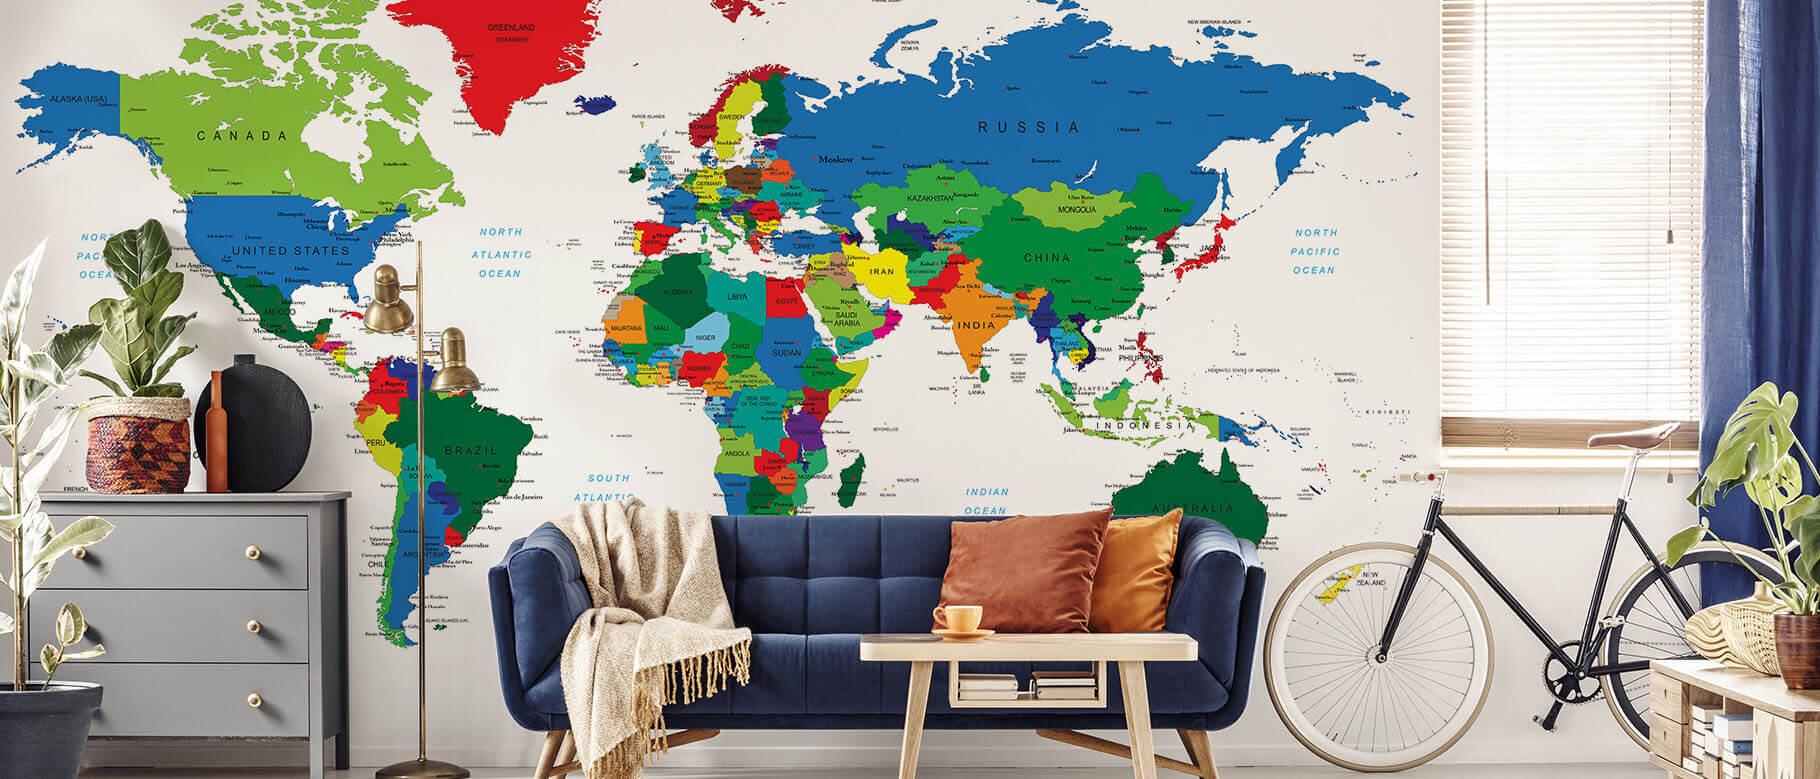 Fototapete politische Landkarte